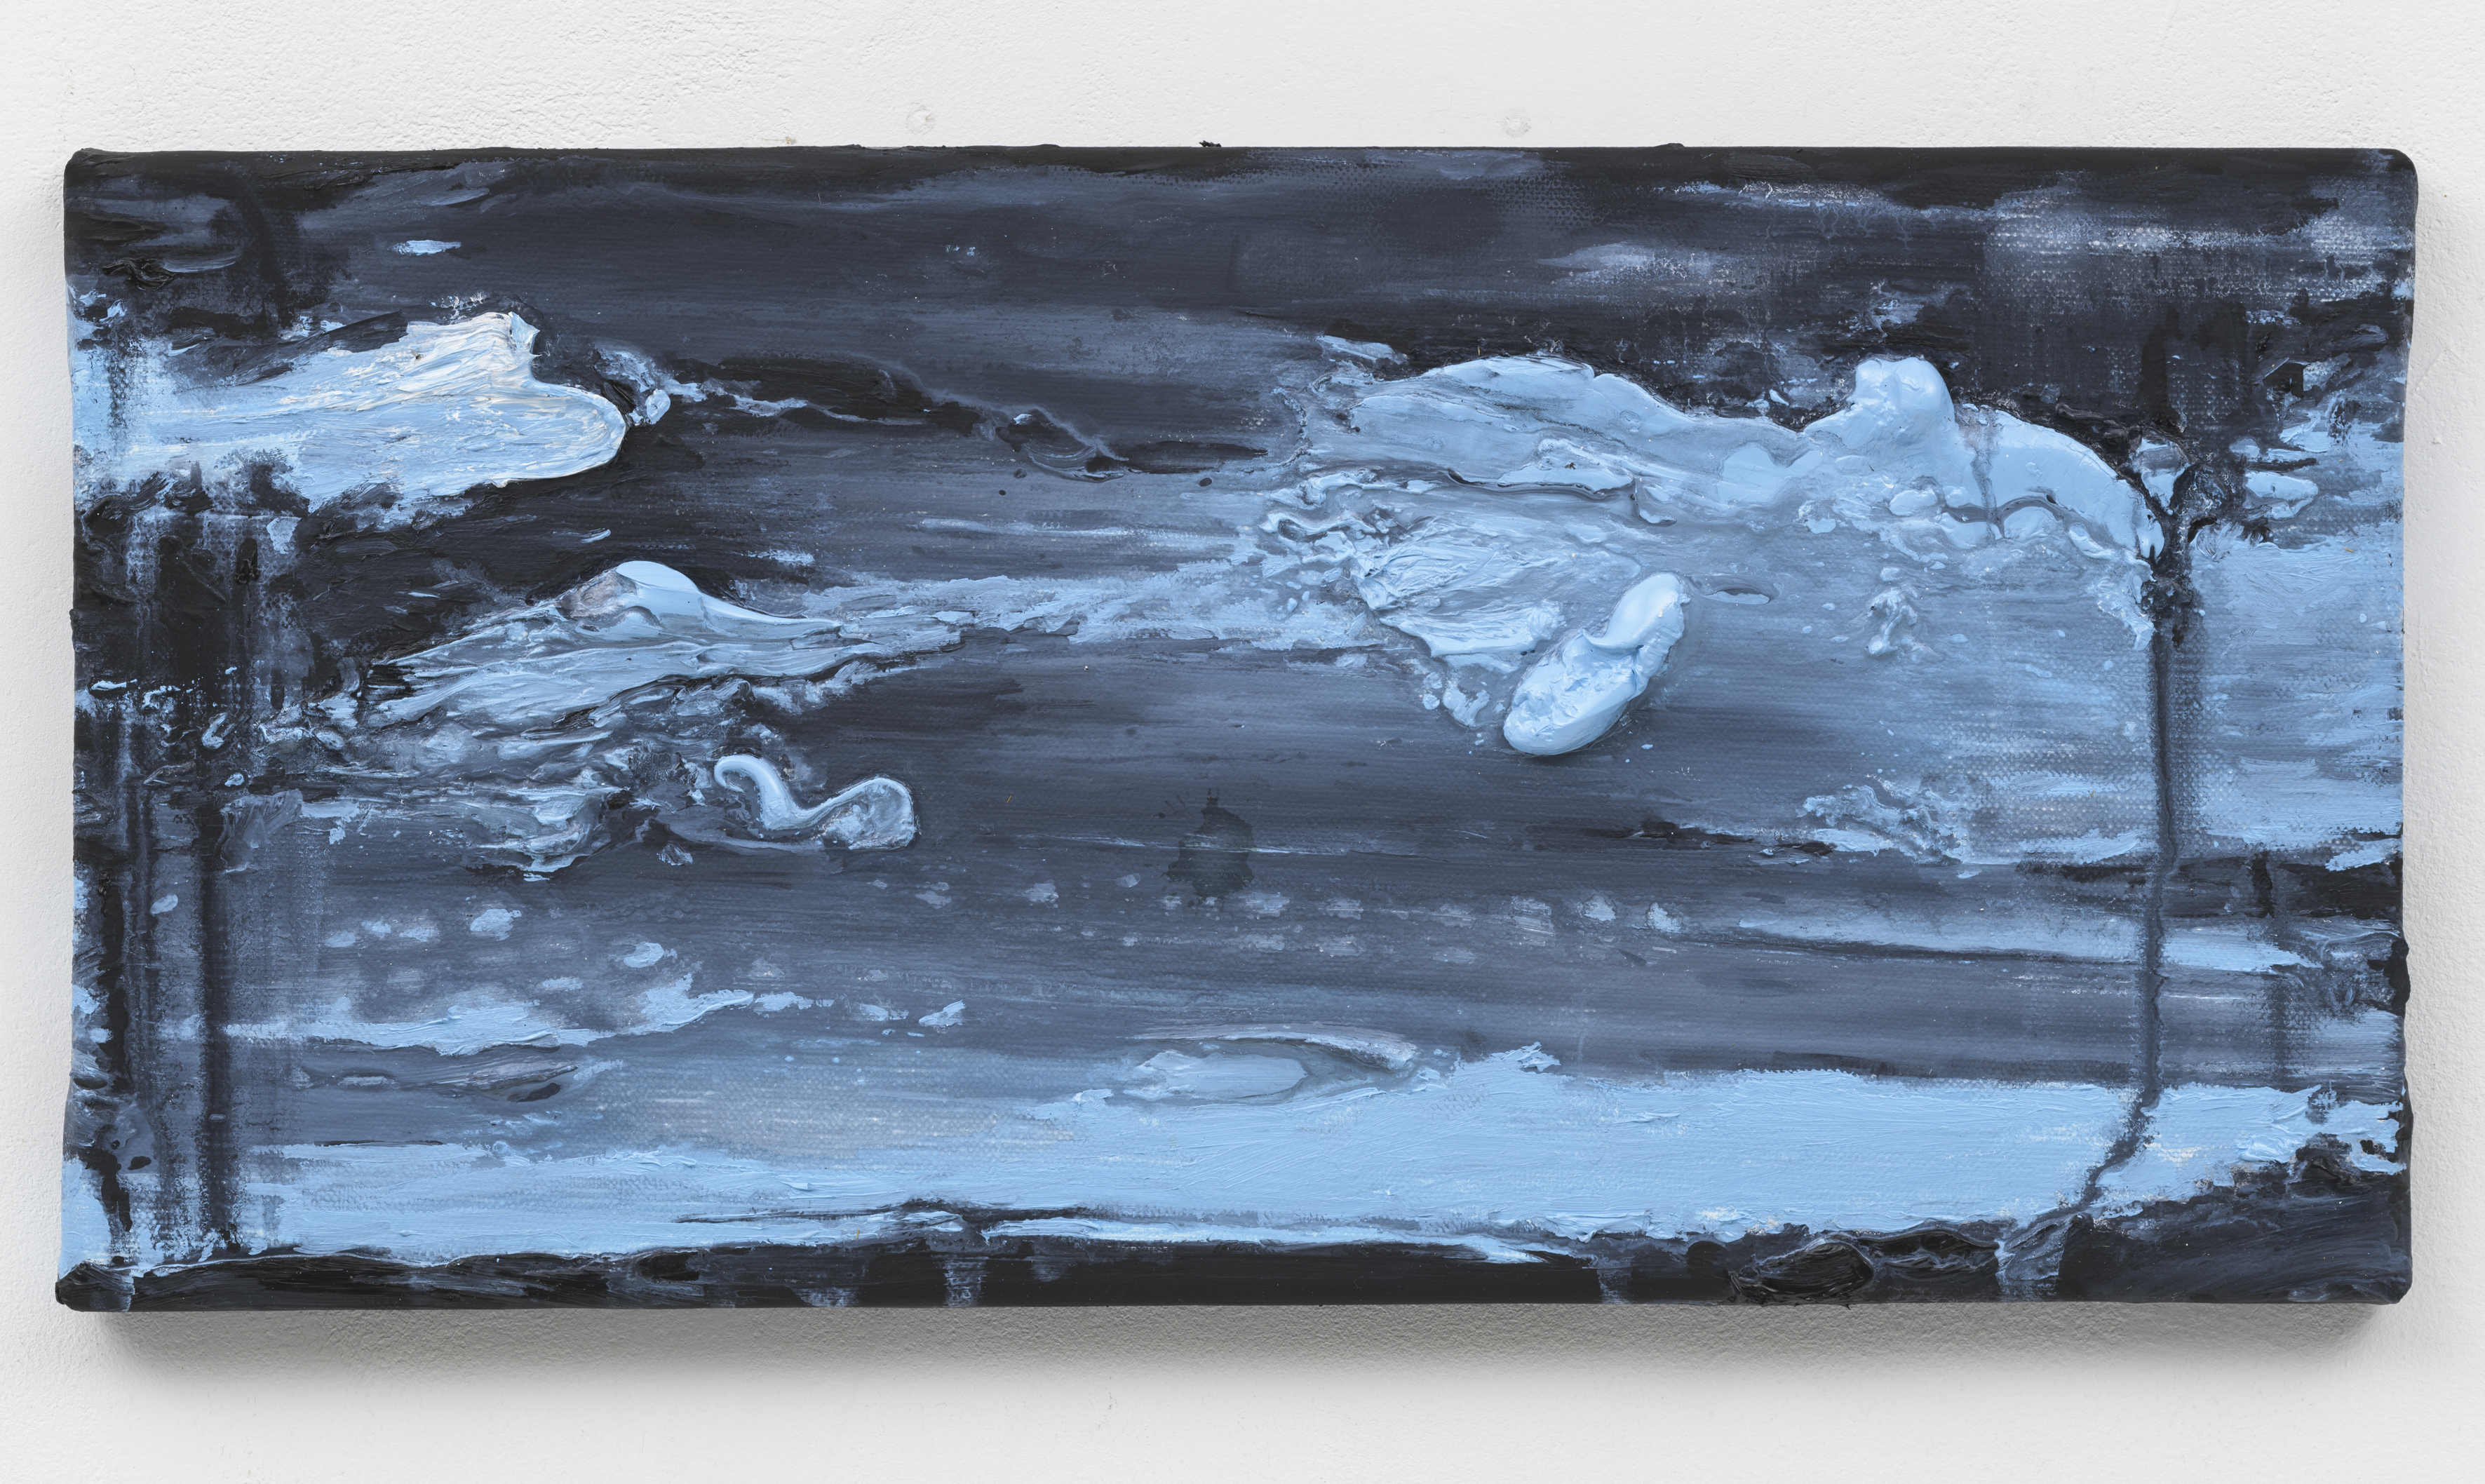 """Wanderung VII, Berlin Suite"" 20 x 40 cm. oil on linen 2018 (Special Edition, Berlin)"